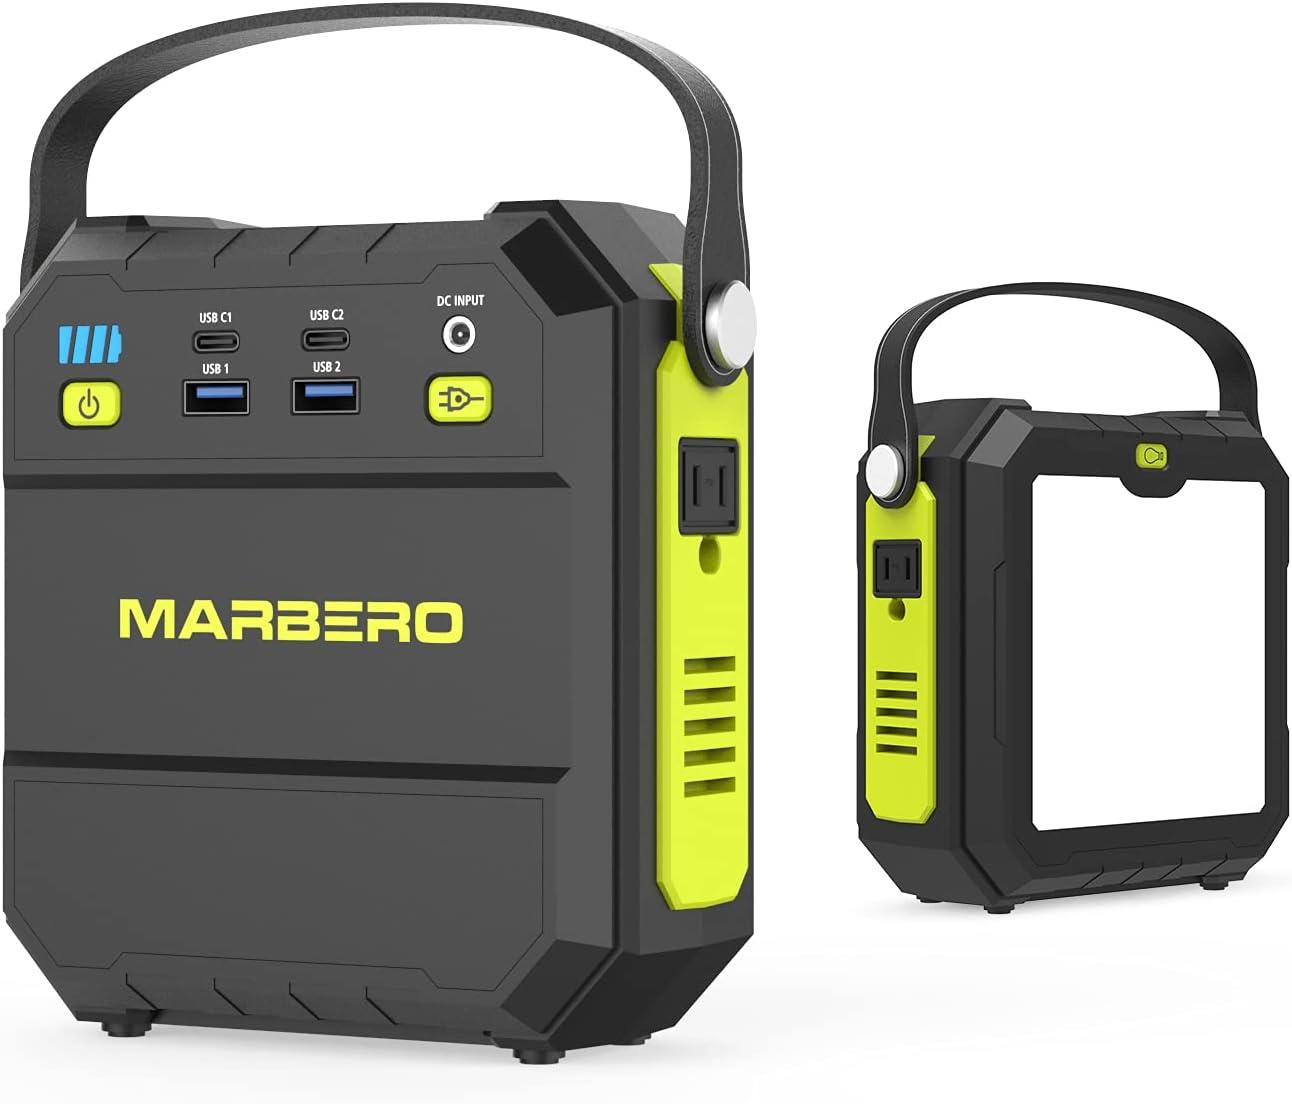 Marbero  22500mAh  83Wh Portable Power Station $40.49 Coupon